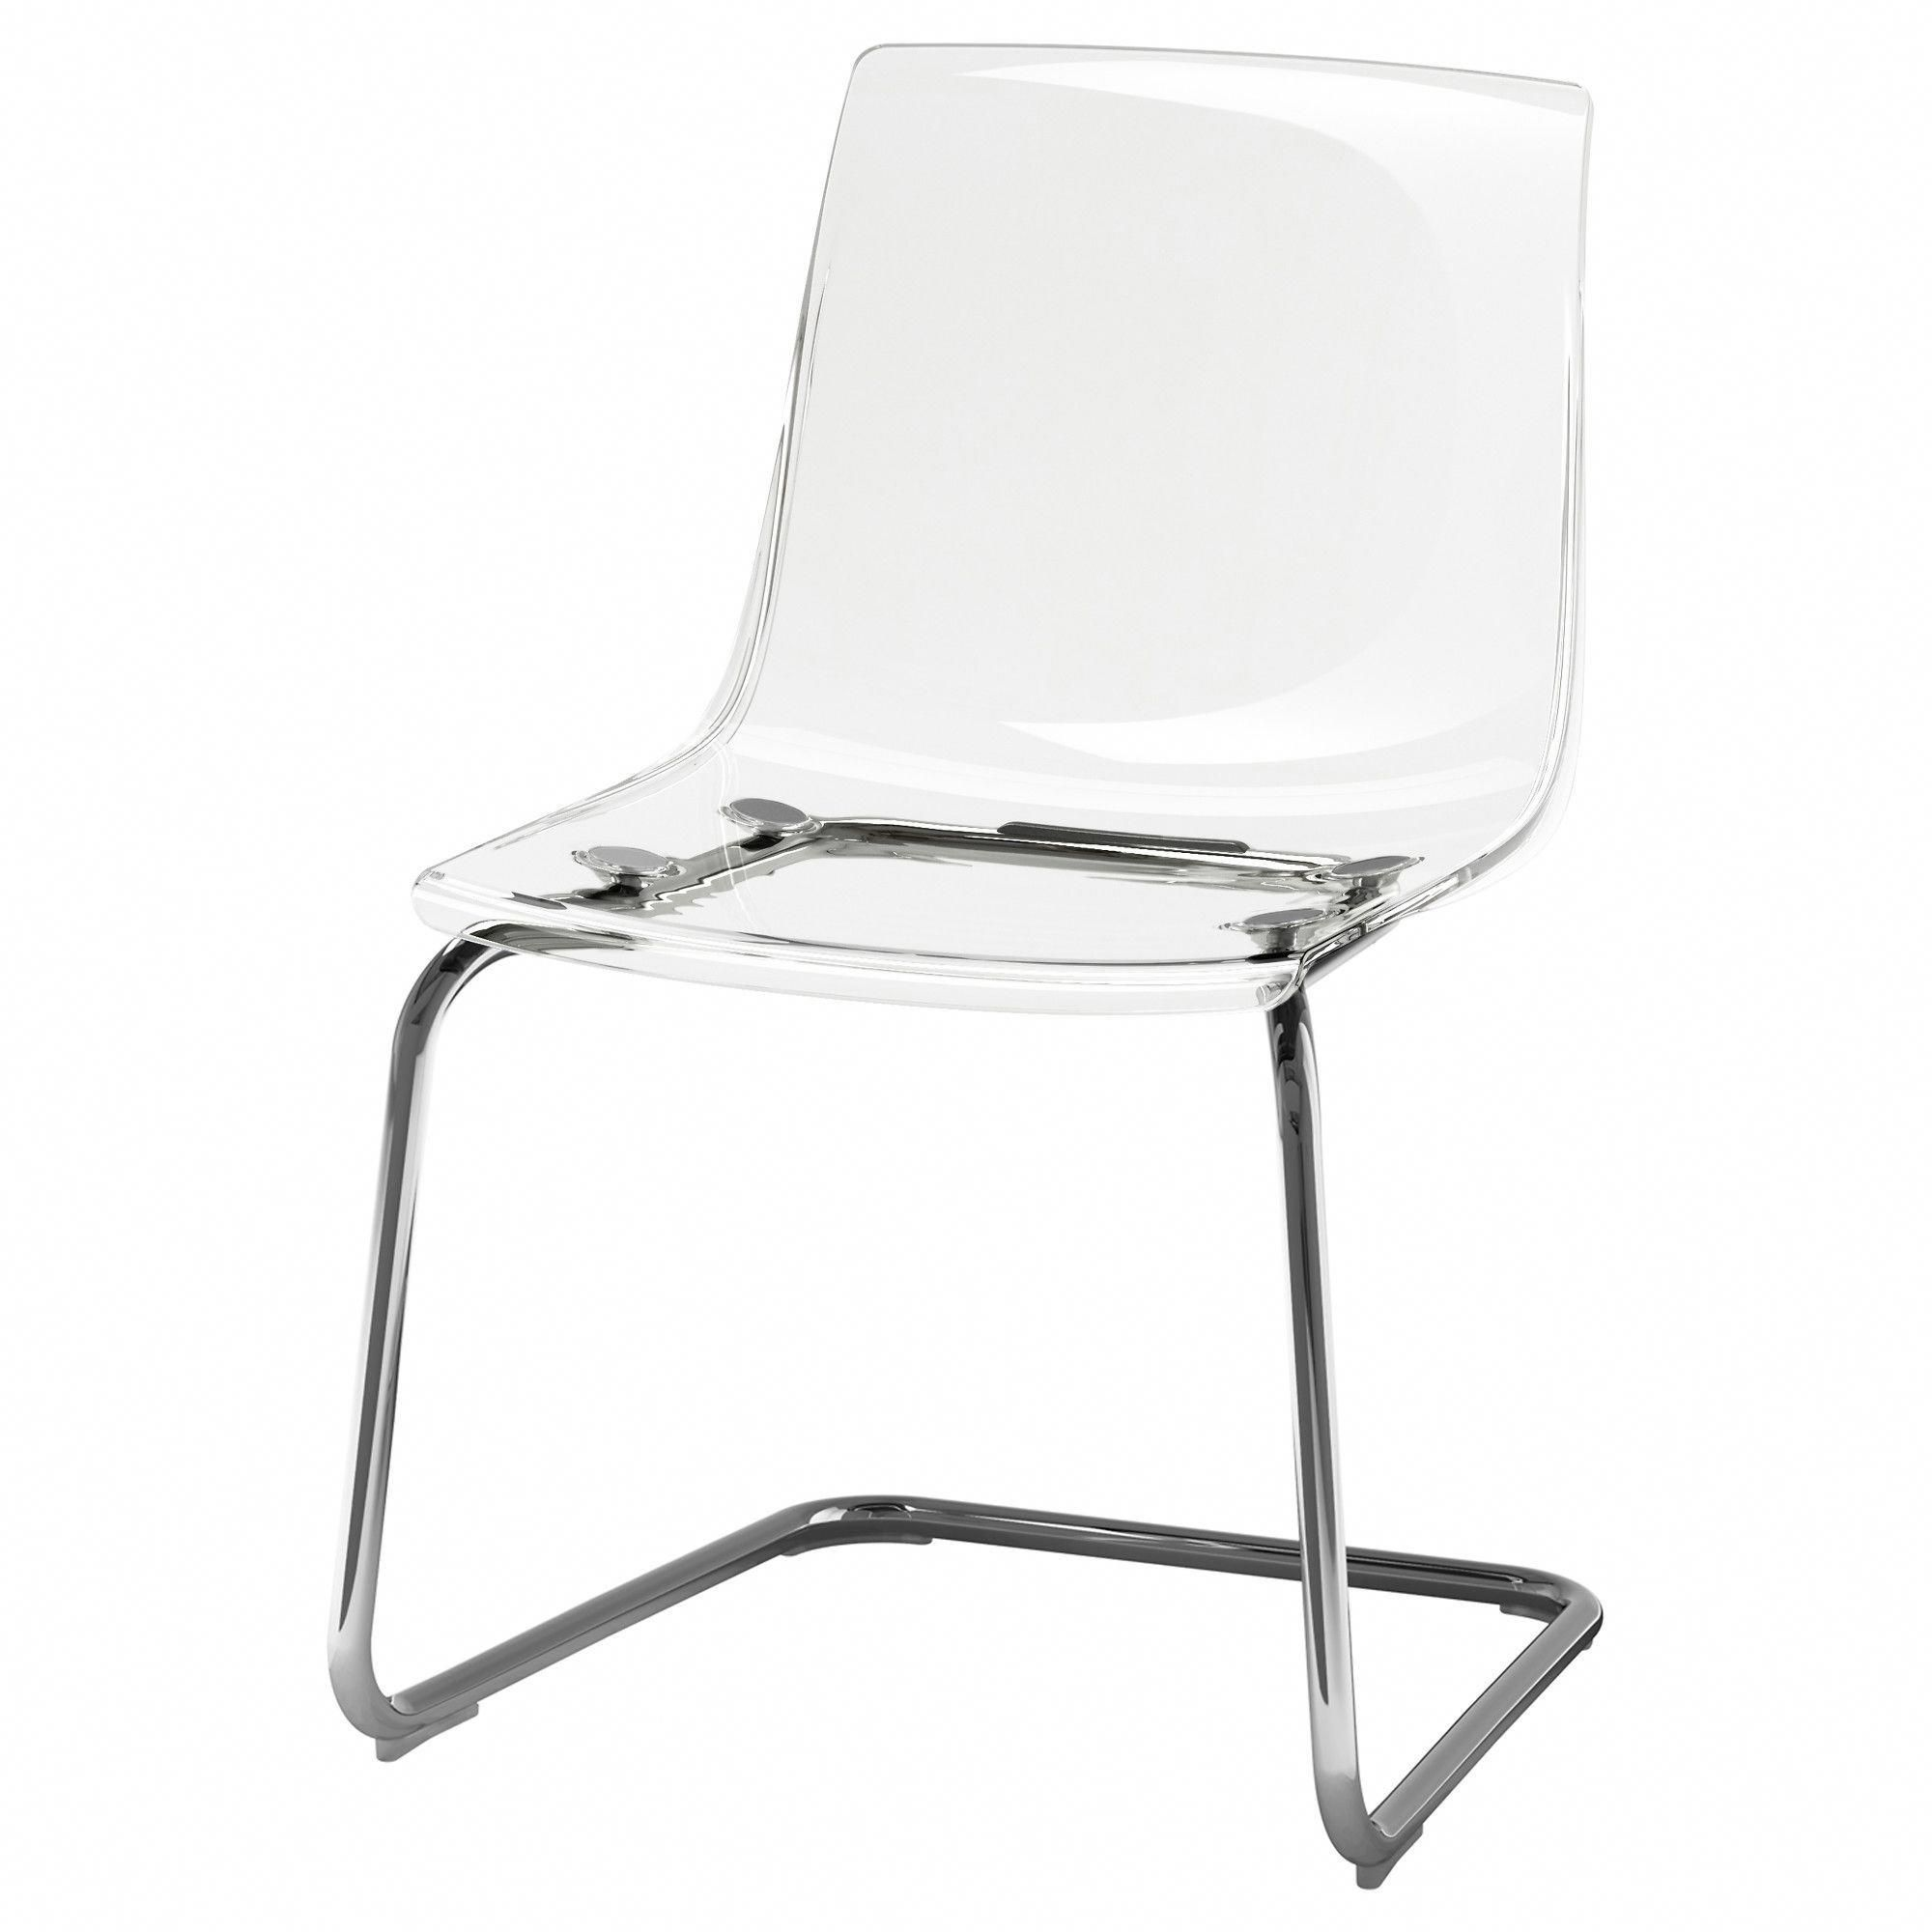 IKEA TOBIAS Clear, Chrome Plated Chair in 2020 Chair